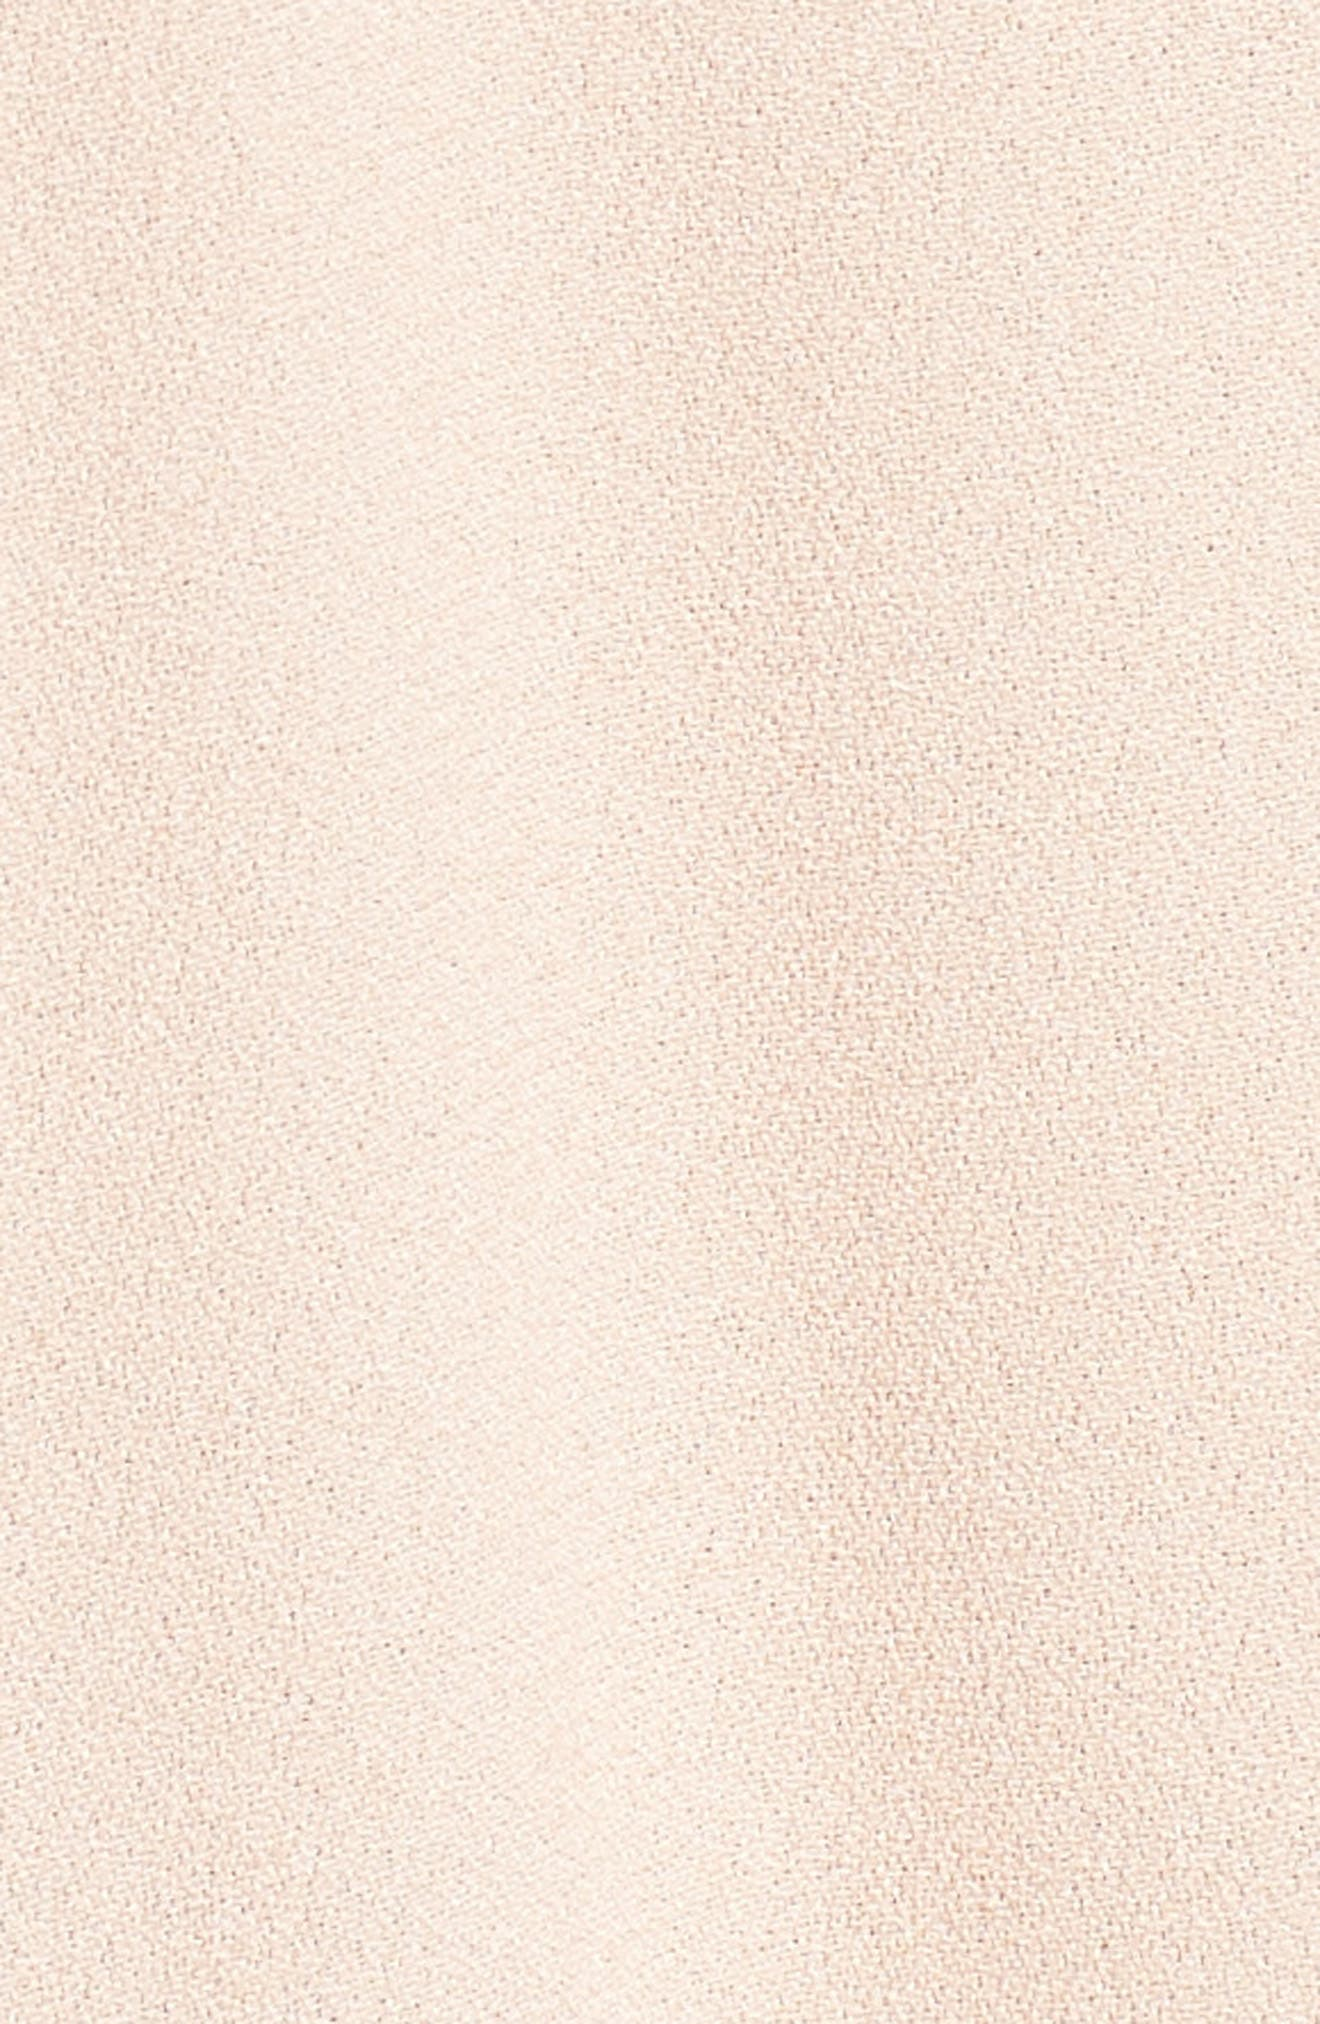 Sofie Thong Bodysuit & Scarf,                             Alternate thumbnail 25, color,